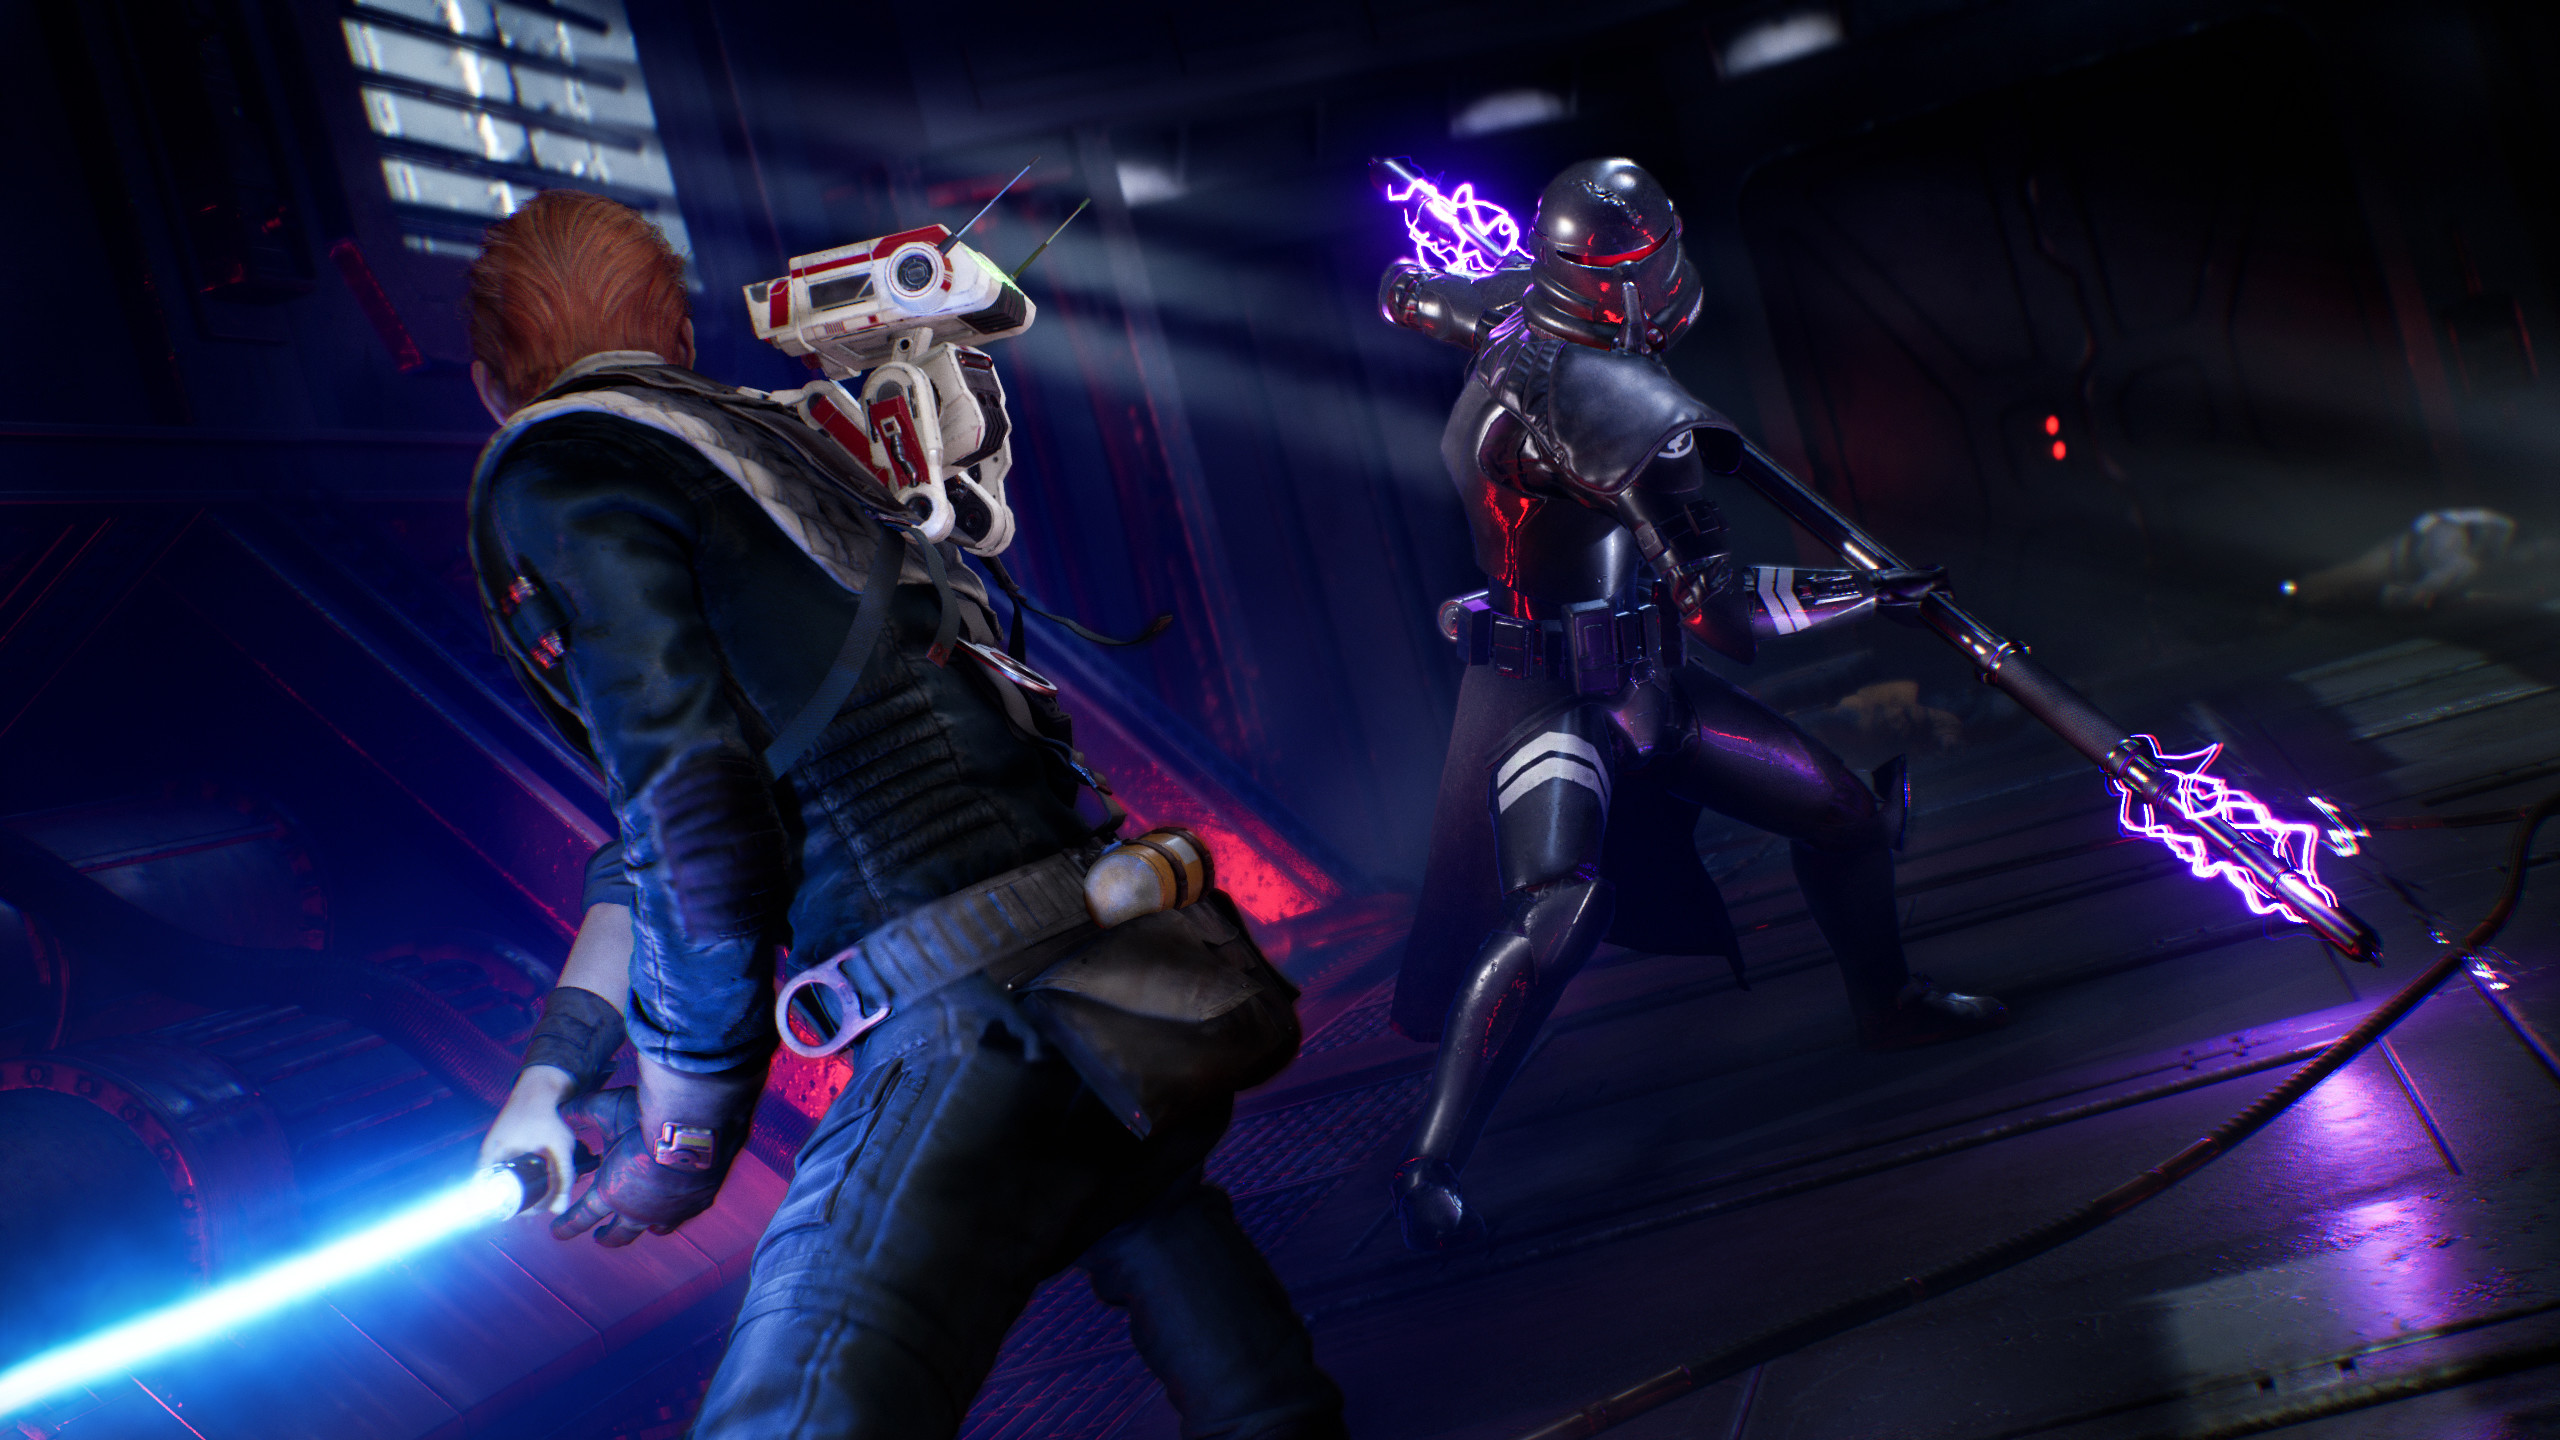 star wars jedi fallen order android gameplay